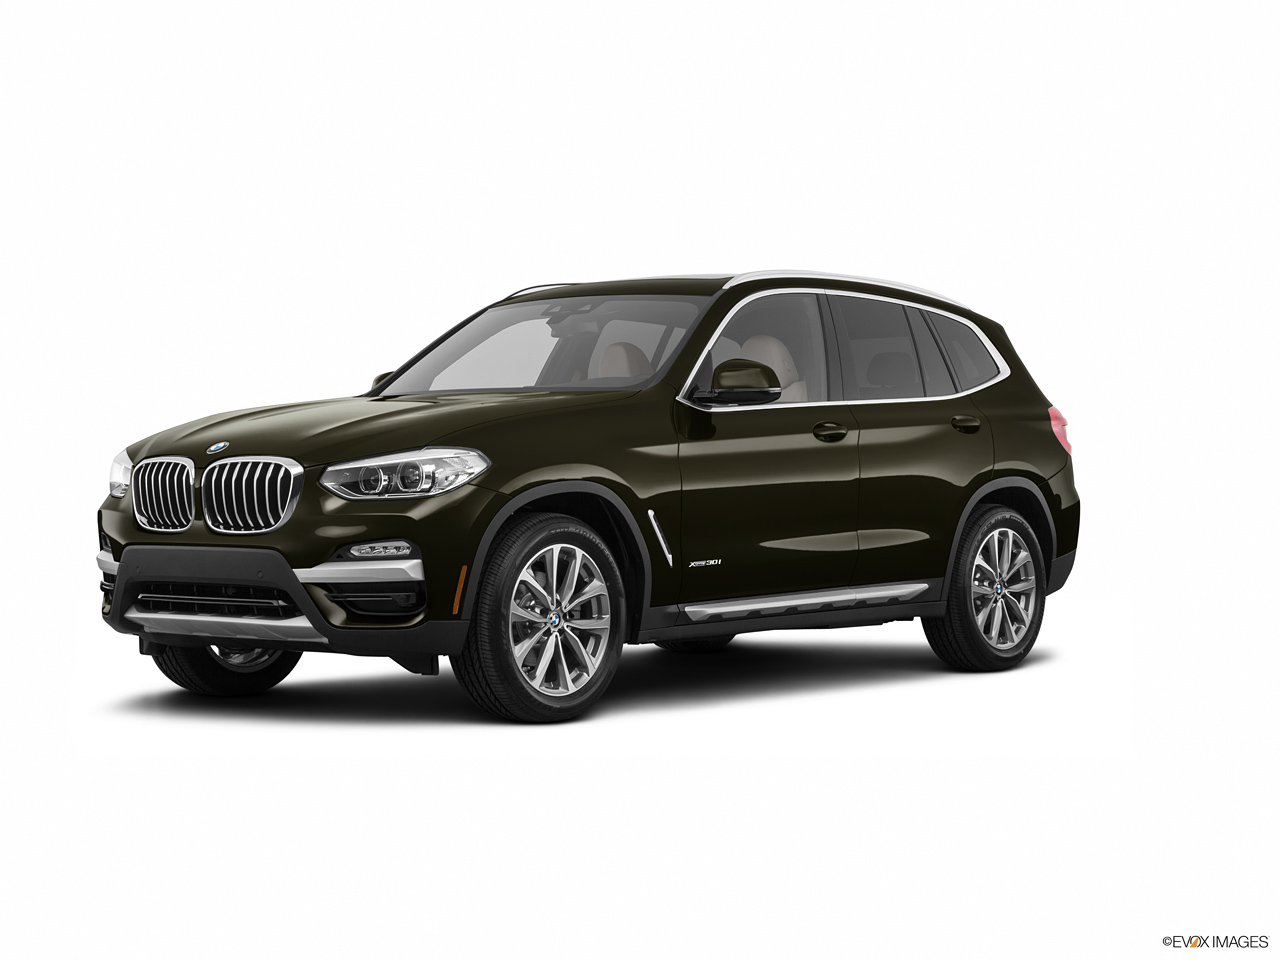 car pictures list for bmw x3 2018 xdrive 28i kuwait. Black Bedroom Furniture Sets. Home Design Ideas